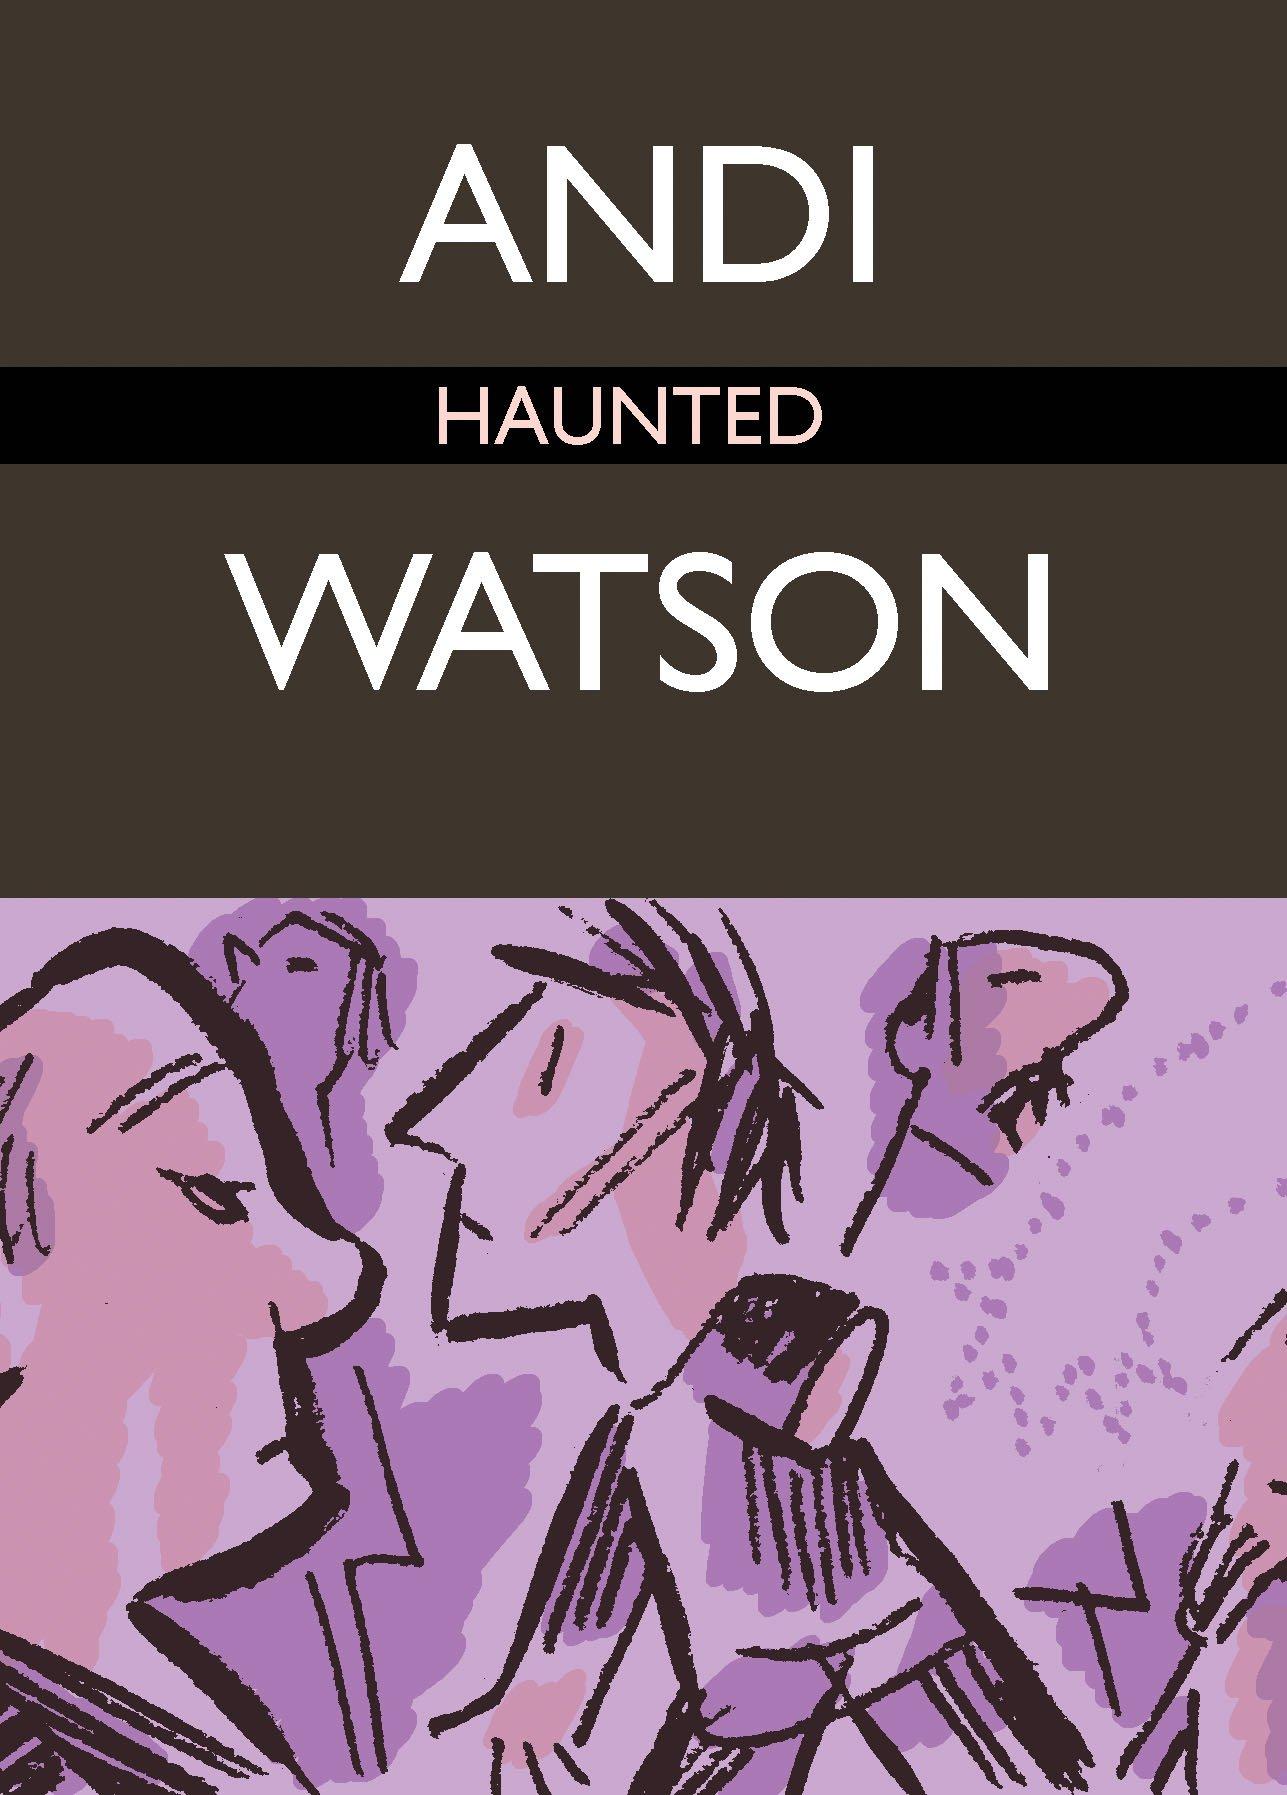 Image of Haunted mini comic